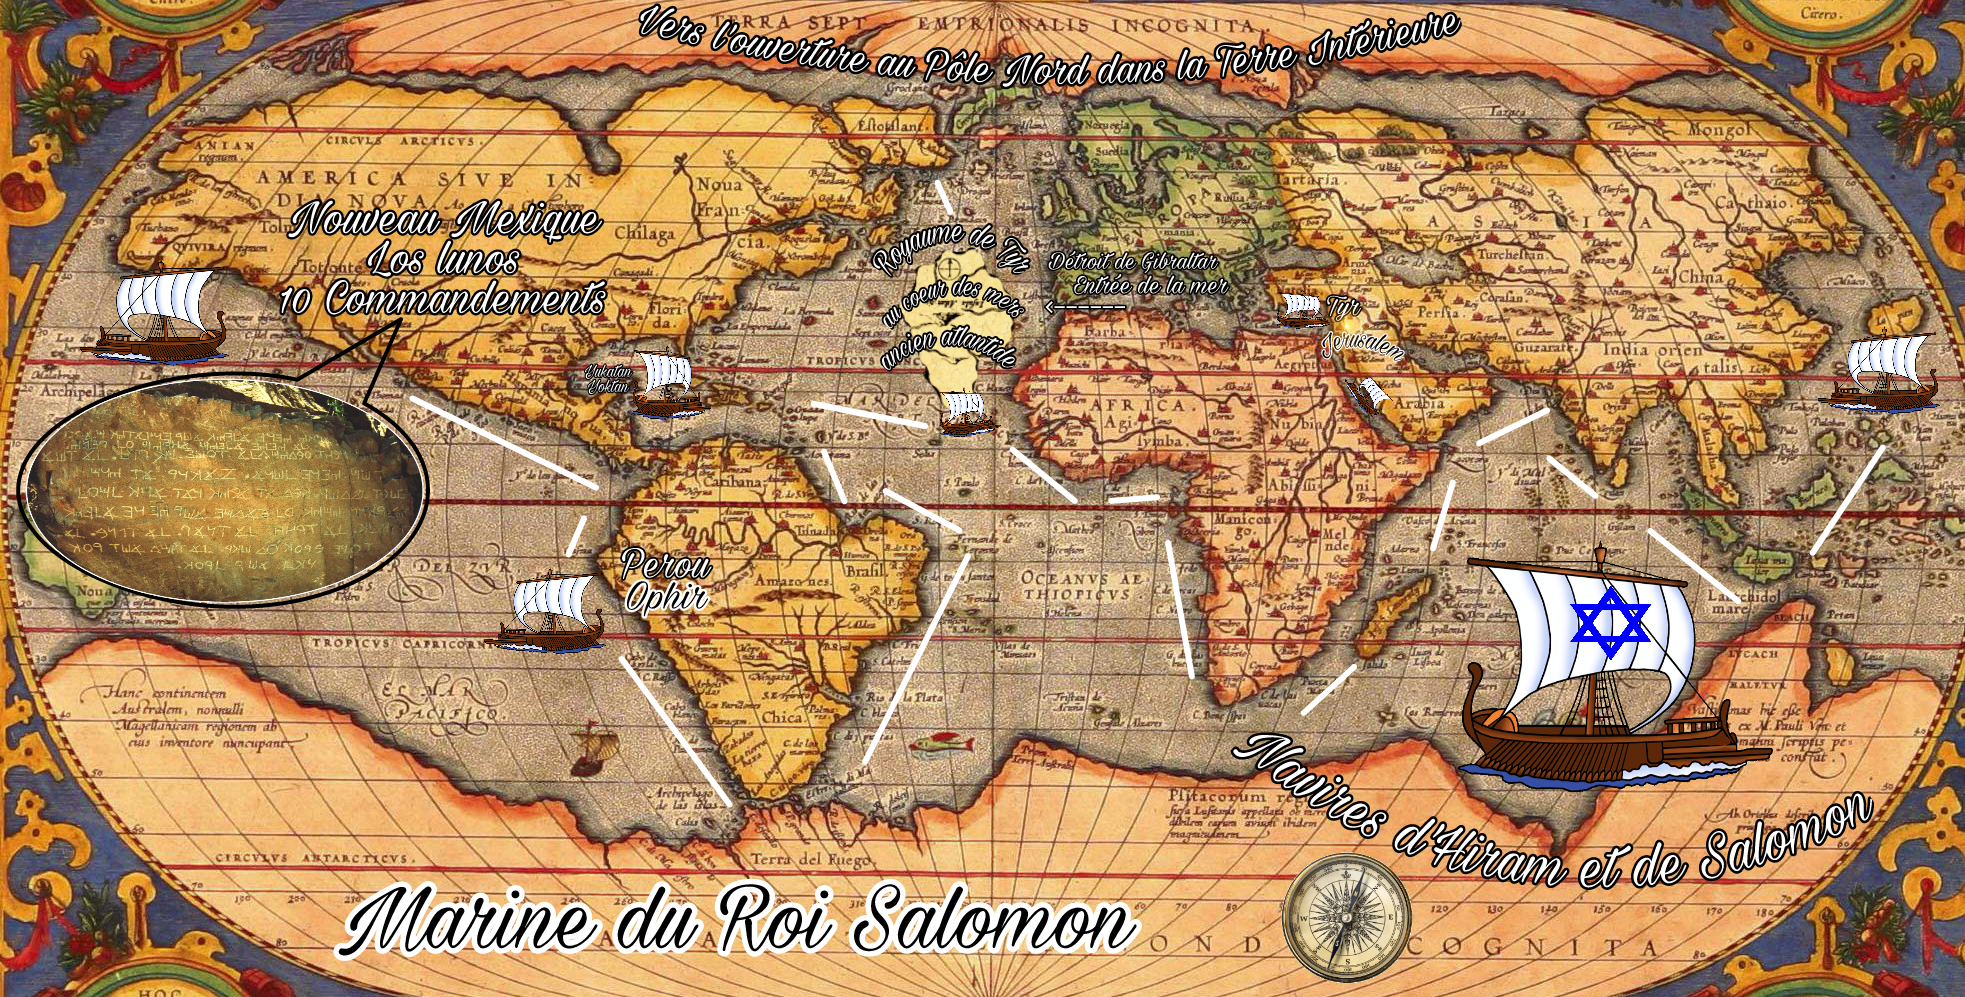 Les navires du Roi Salomon-Atlantide et Tyr-Ophir et Perou 170801034928936856